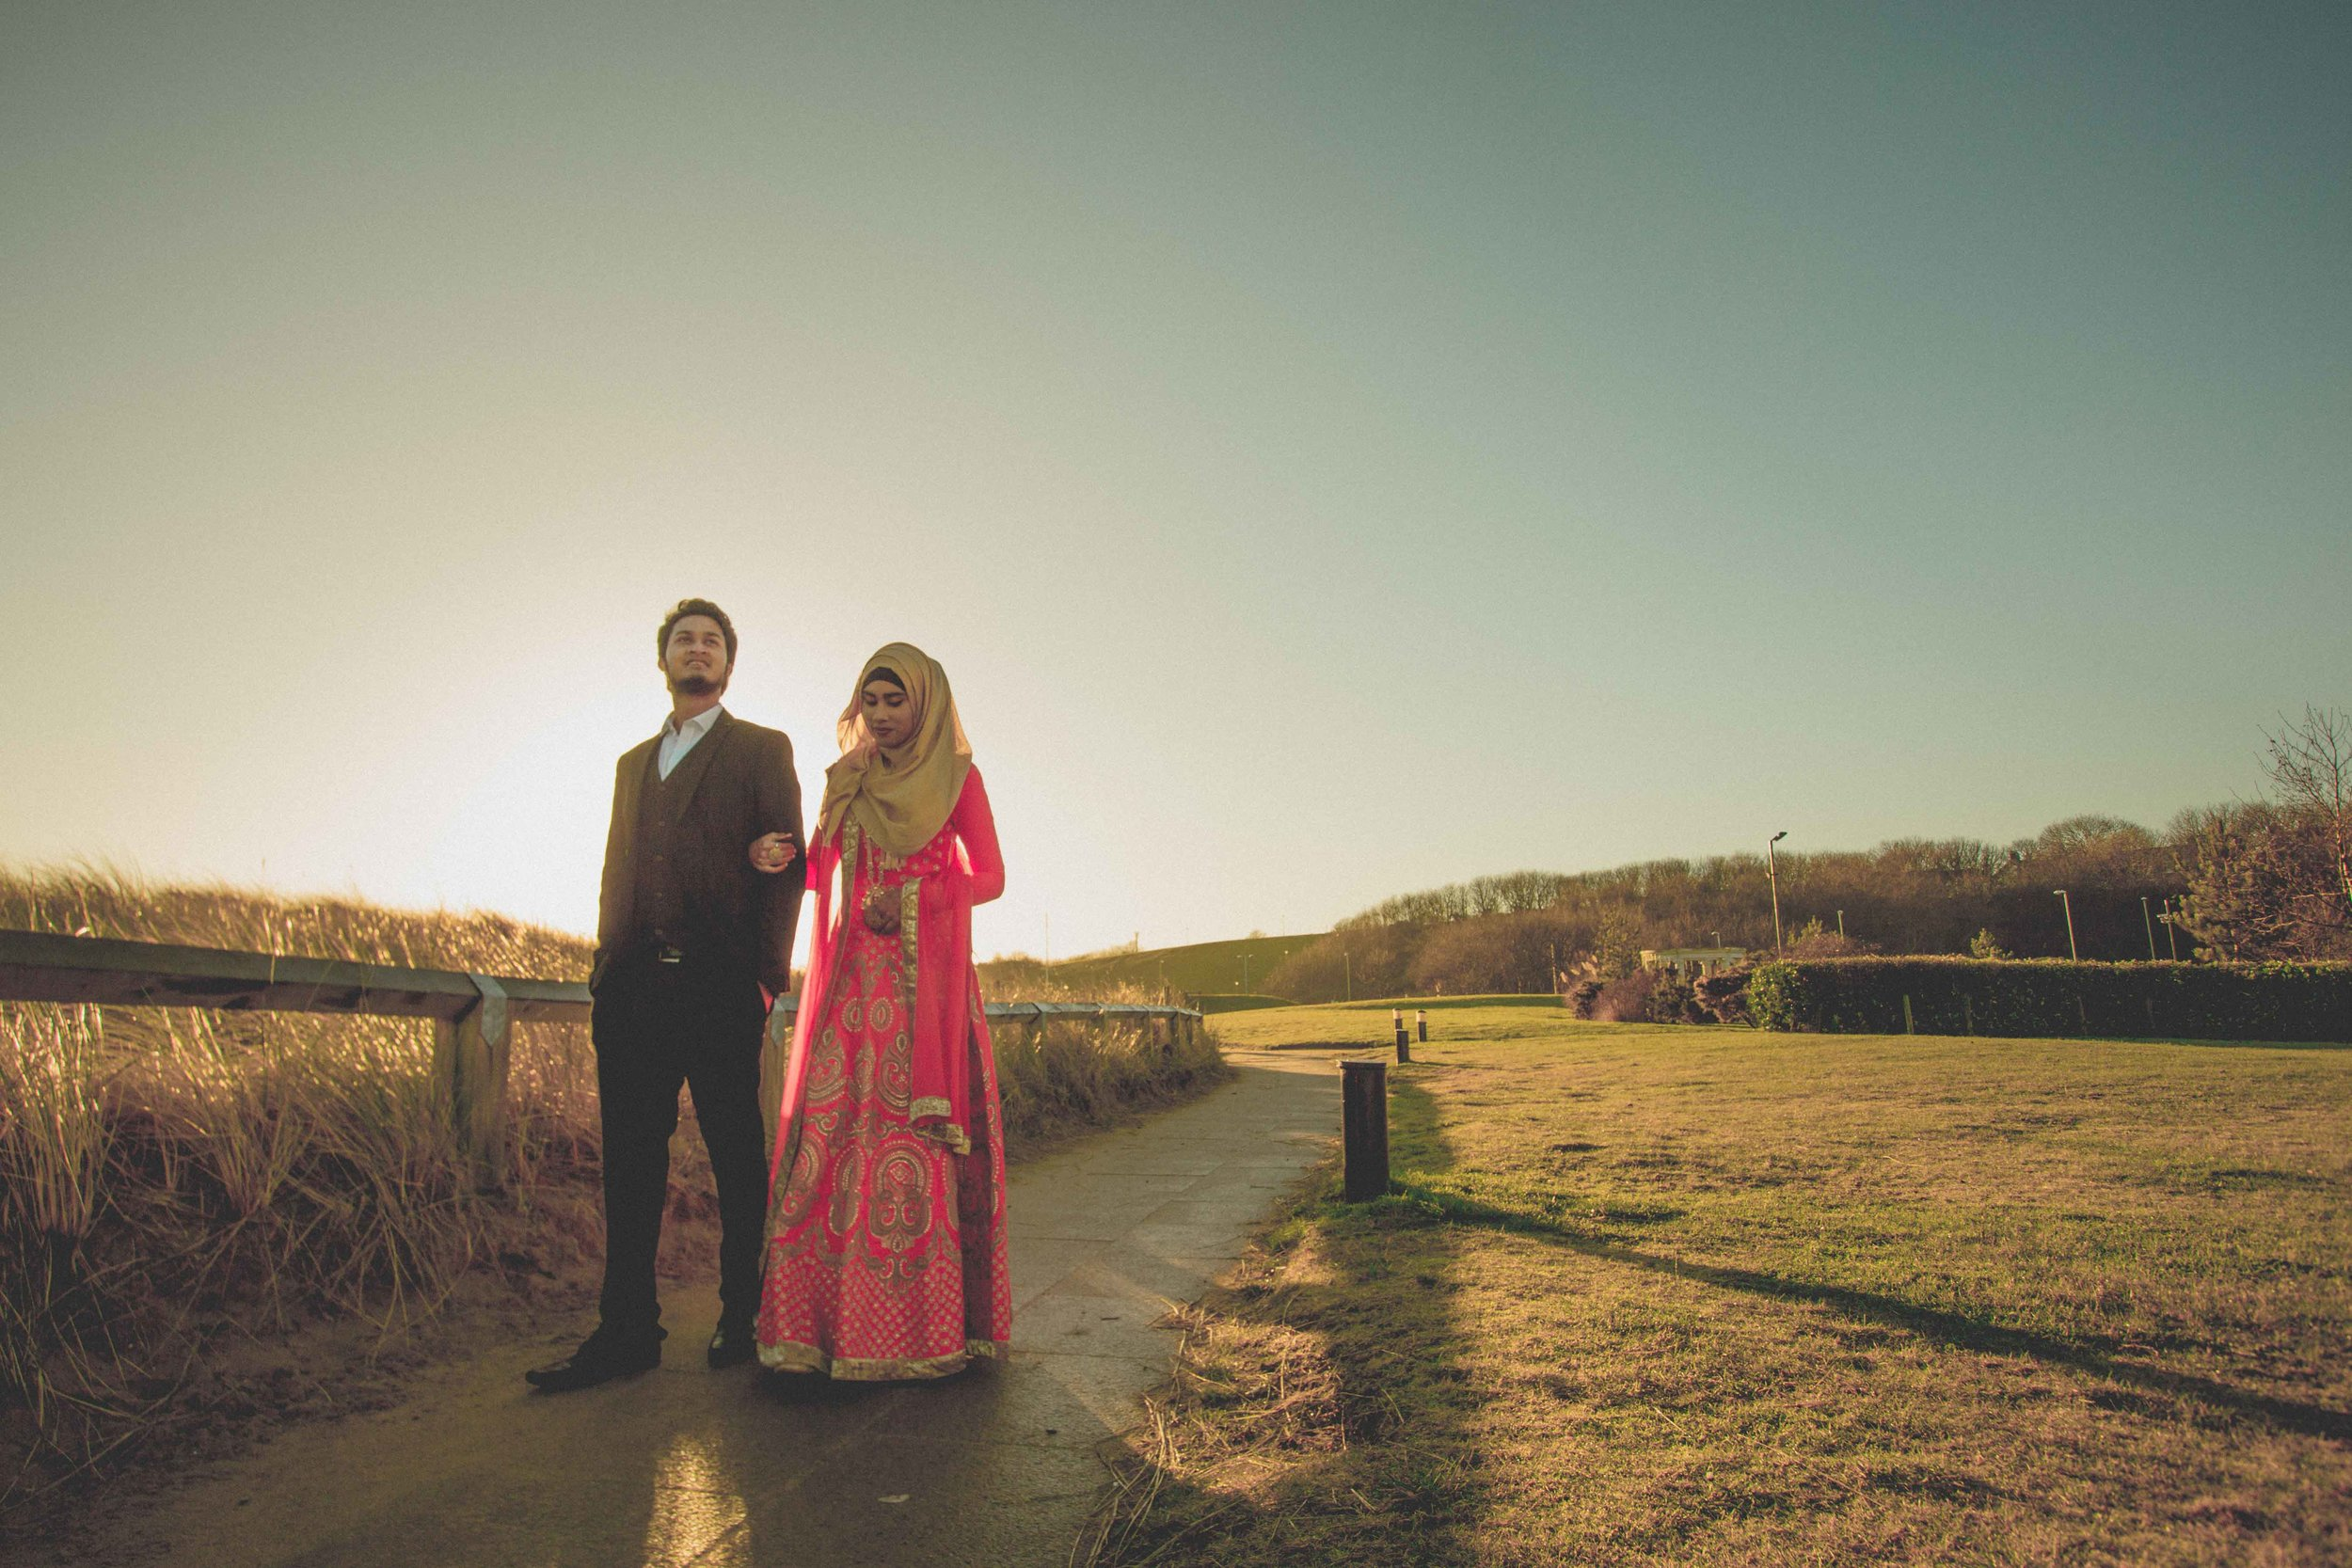 newcastle-beach-lighthouse-couple-prewedding-pre-wedding-shoot-asian-wedding-photographer-natalia-smith-photography-11.jpg